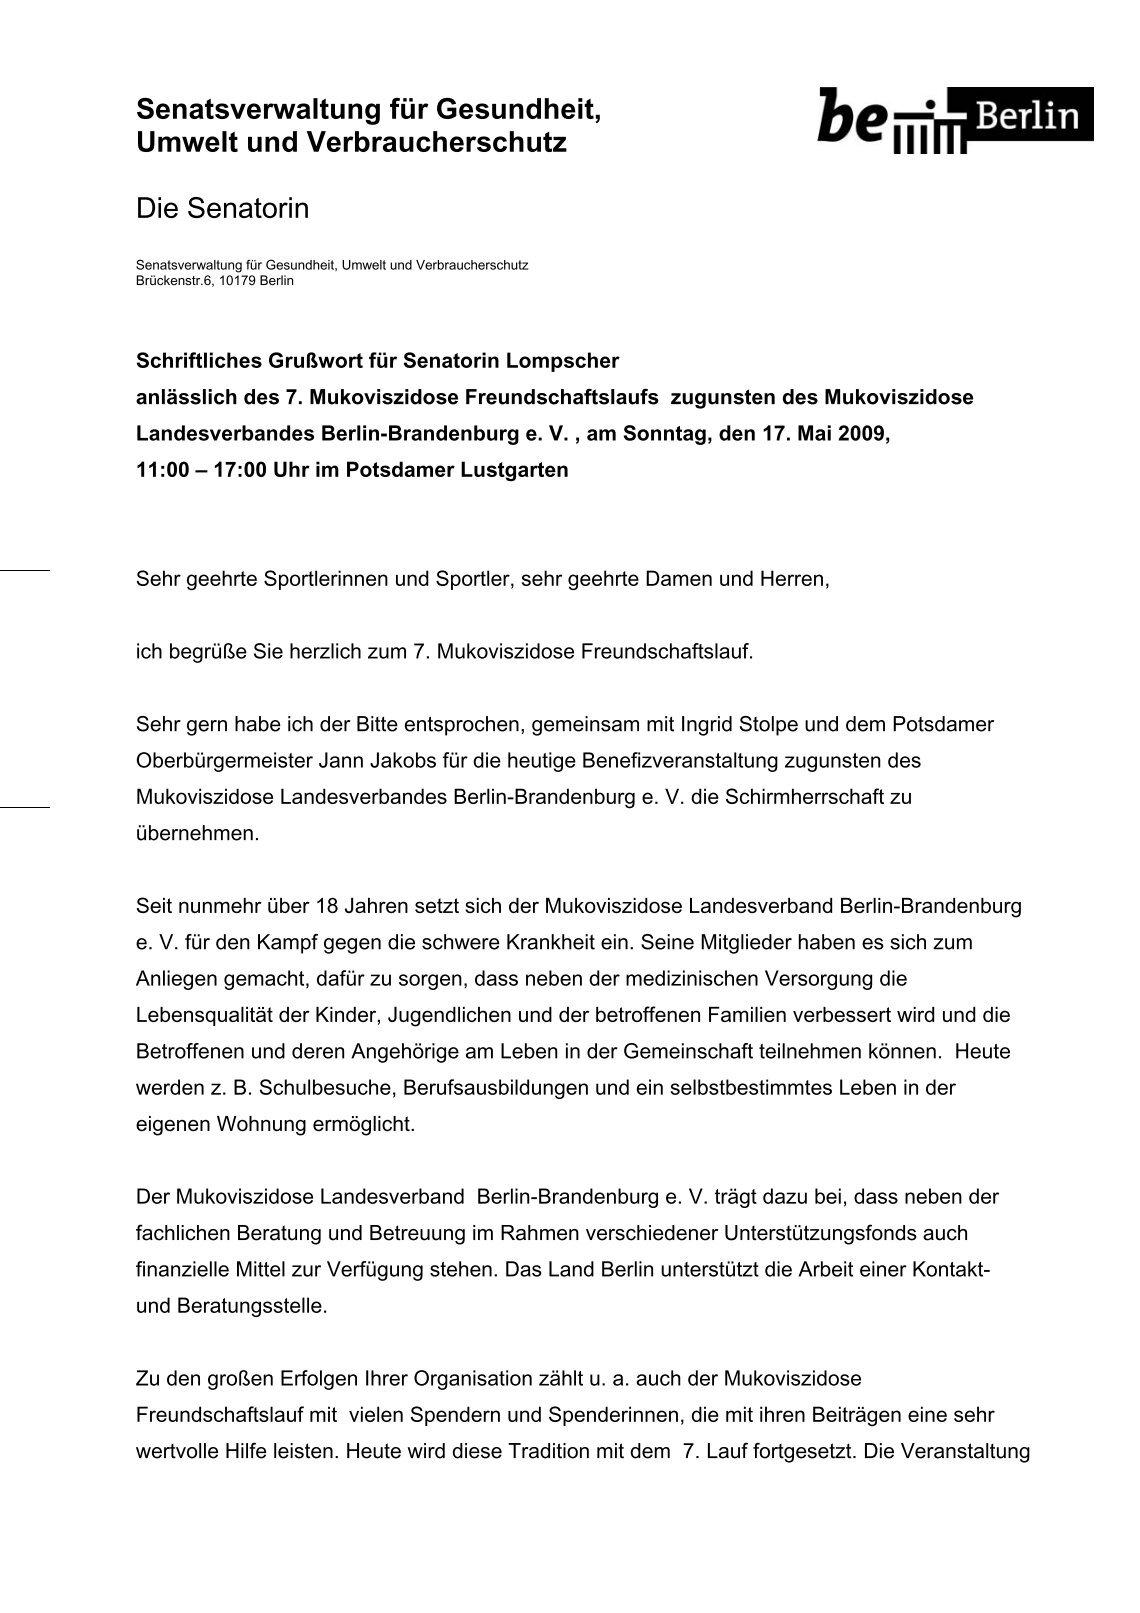 Groß Baptistenjugendpastor Wird Fortgesetzt Fotos - Entry Level ...